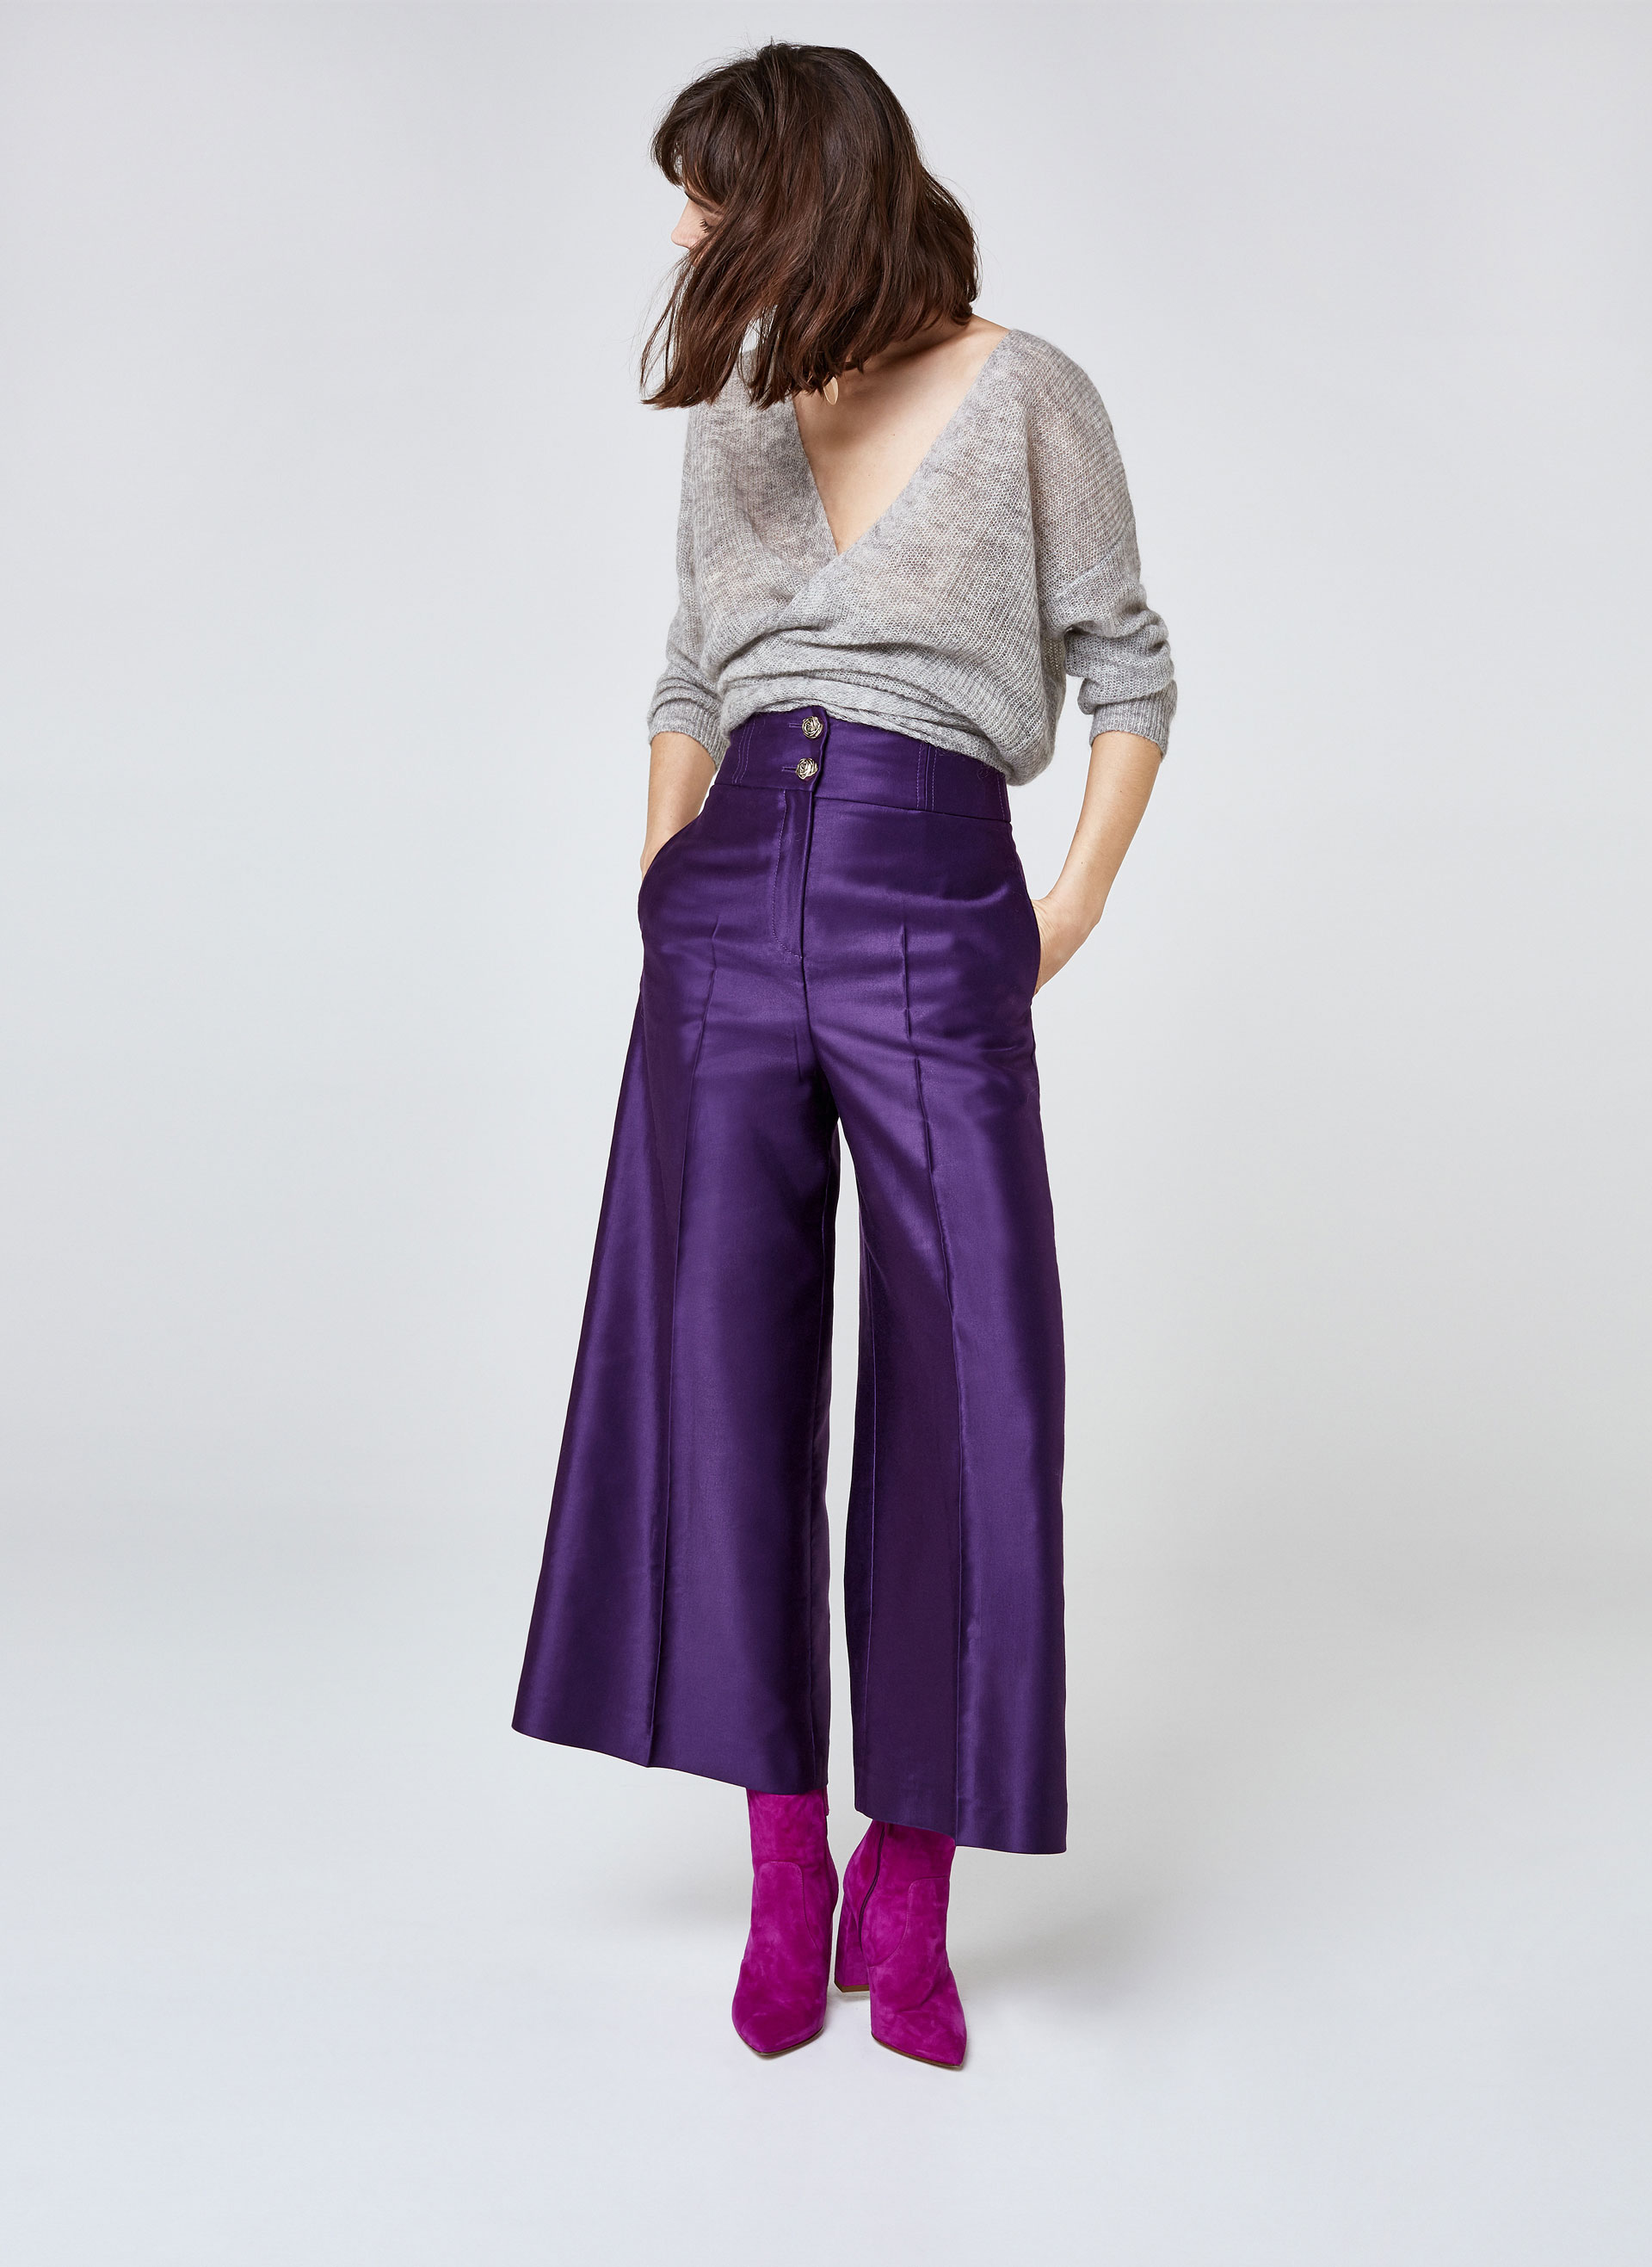 Široke hlače sa sjajem Uterqüe 950 kn